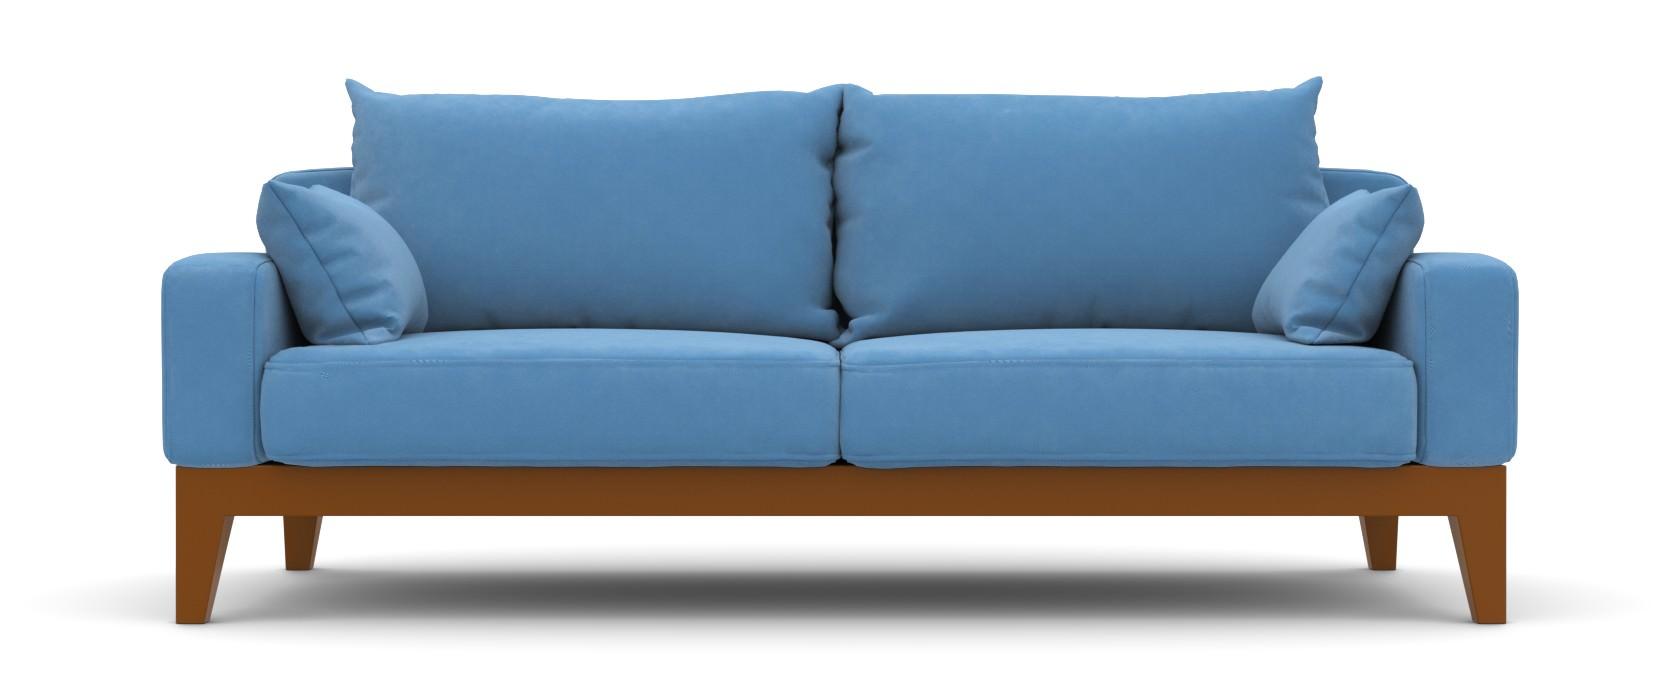 Тримісний диван Antonio - Фото 1 - Pufetto